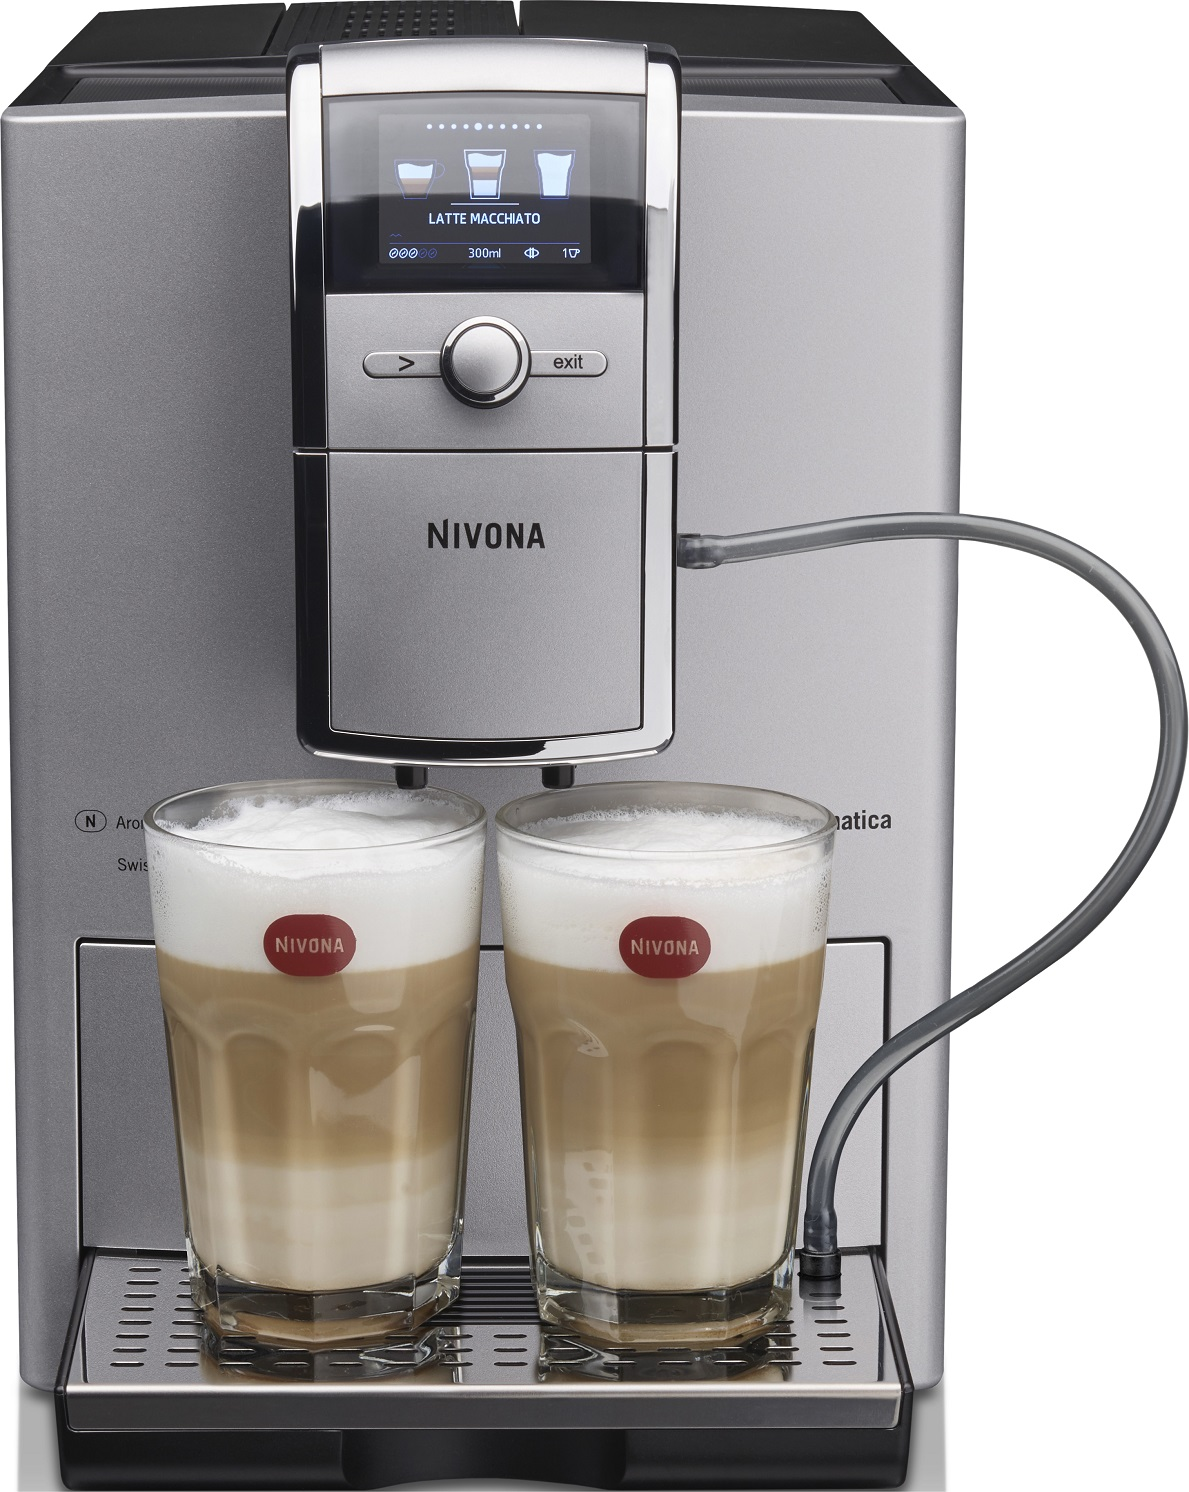 Кофемашина Nivona NICR 842, серебристый